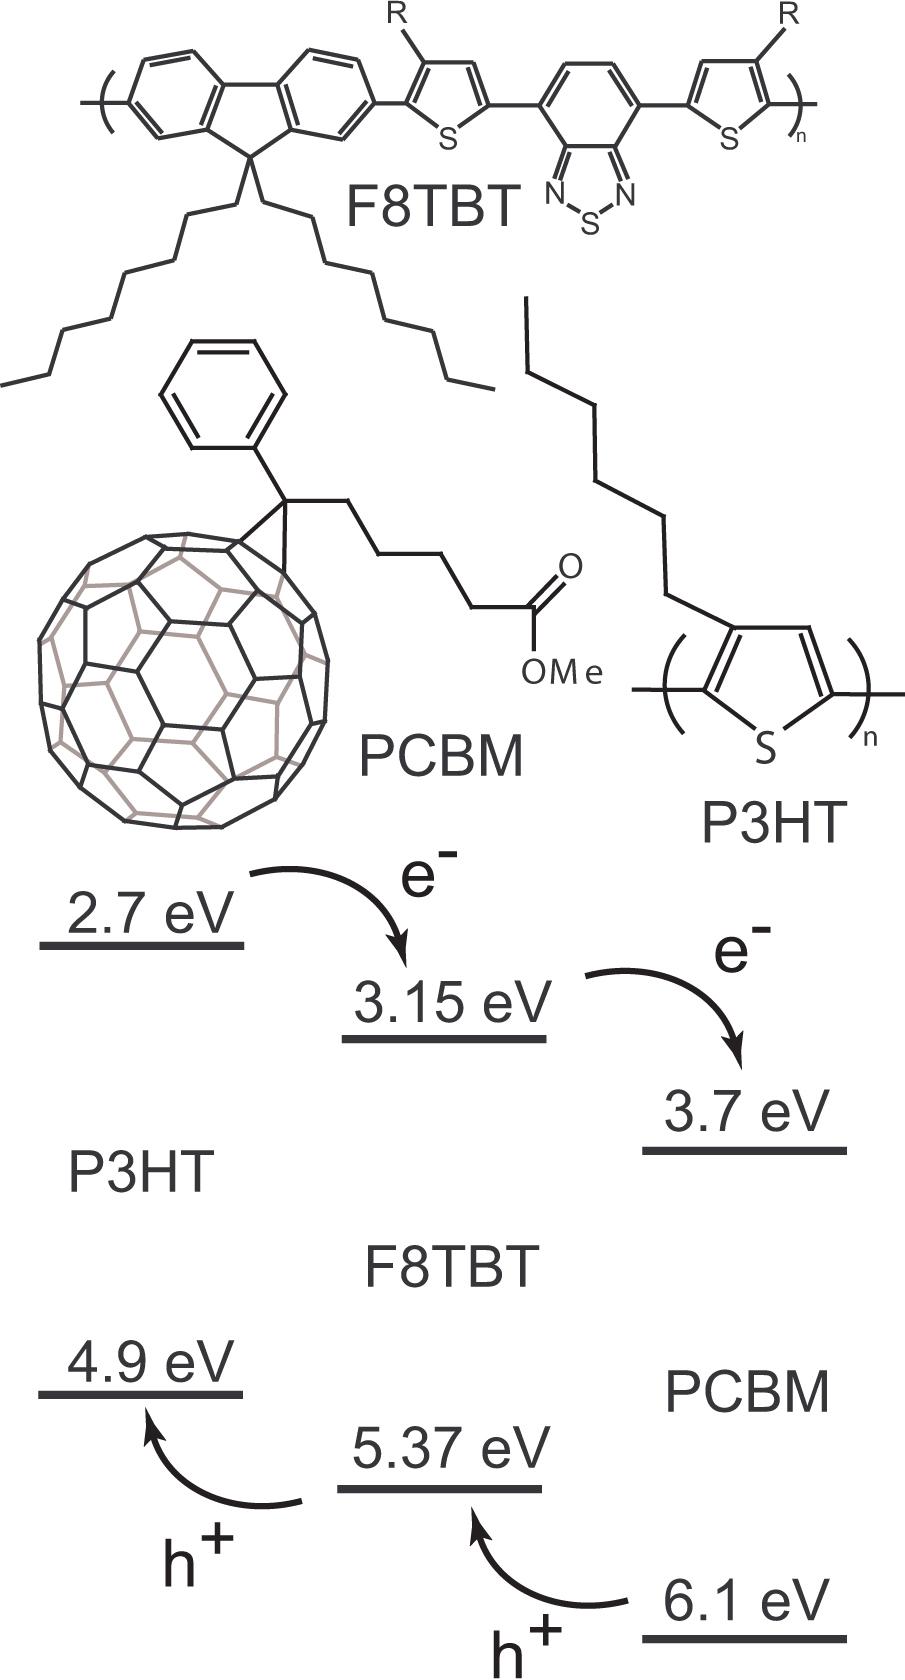 polymer plastic  solar cell